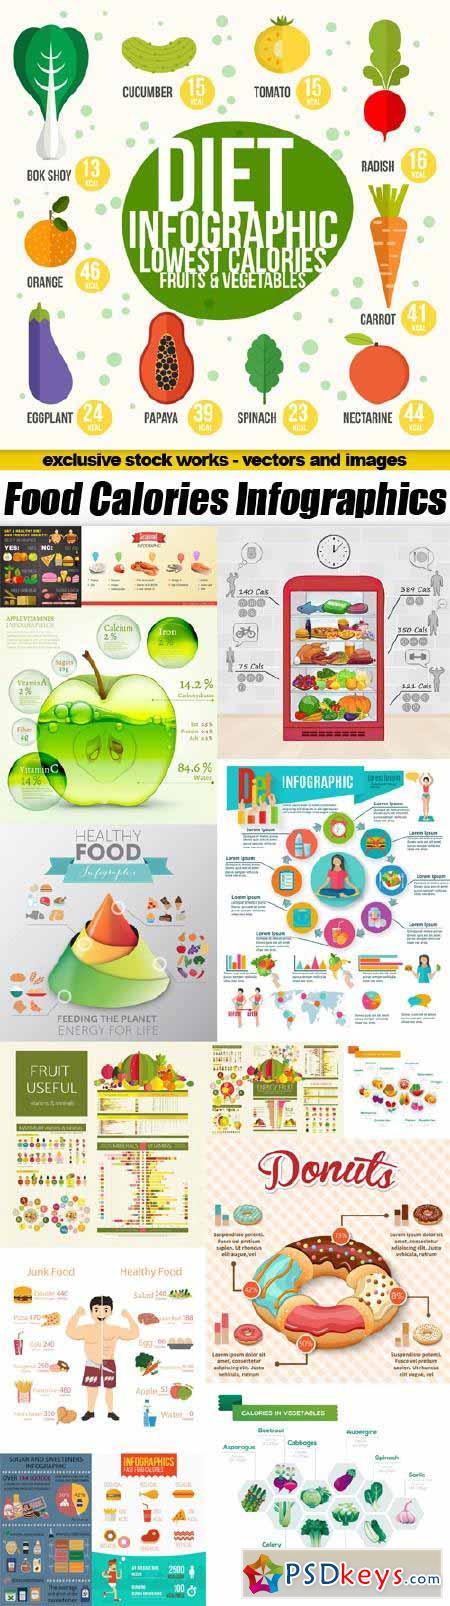 Food Calories Infographics - 15x EPS